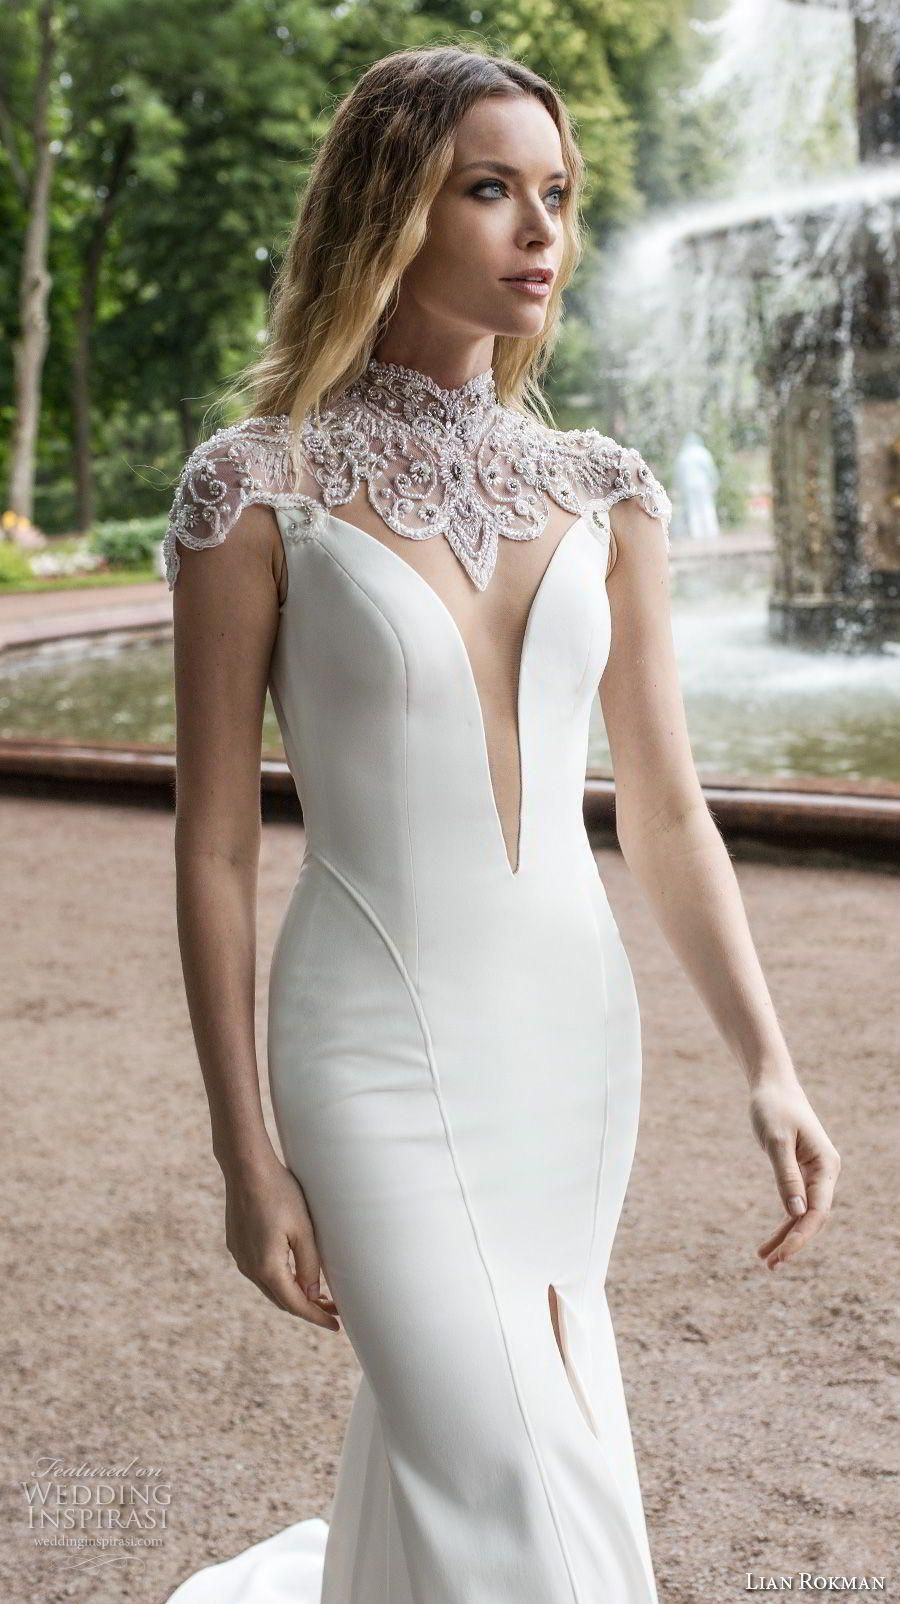 Lian rokman bridal cap sleeves high neck deep plunging